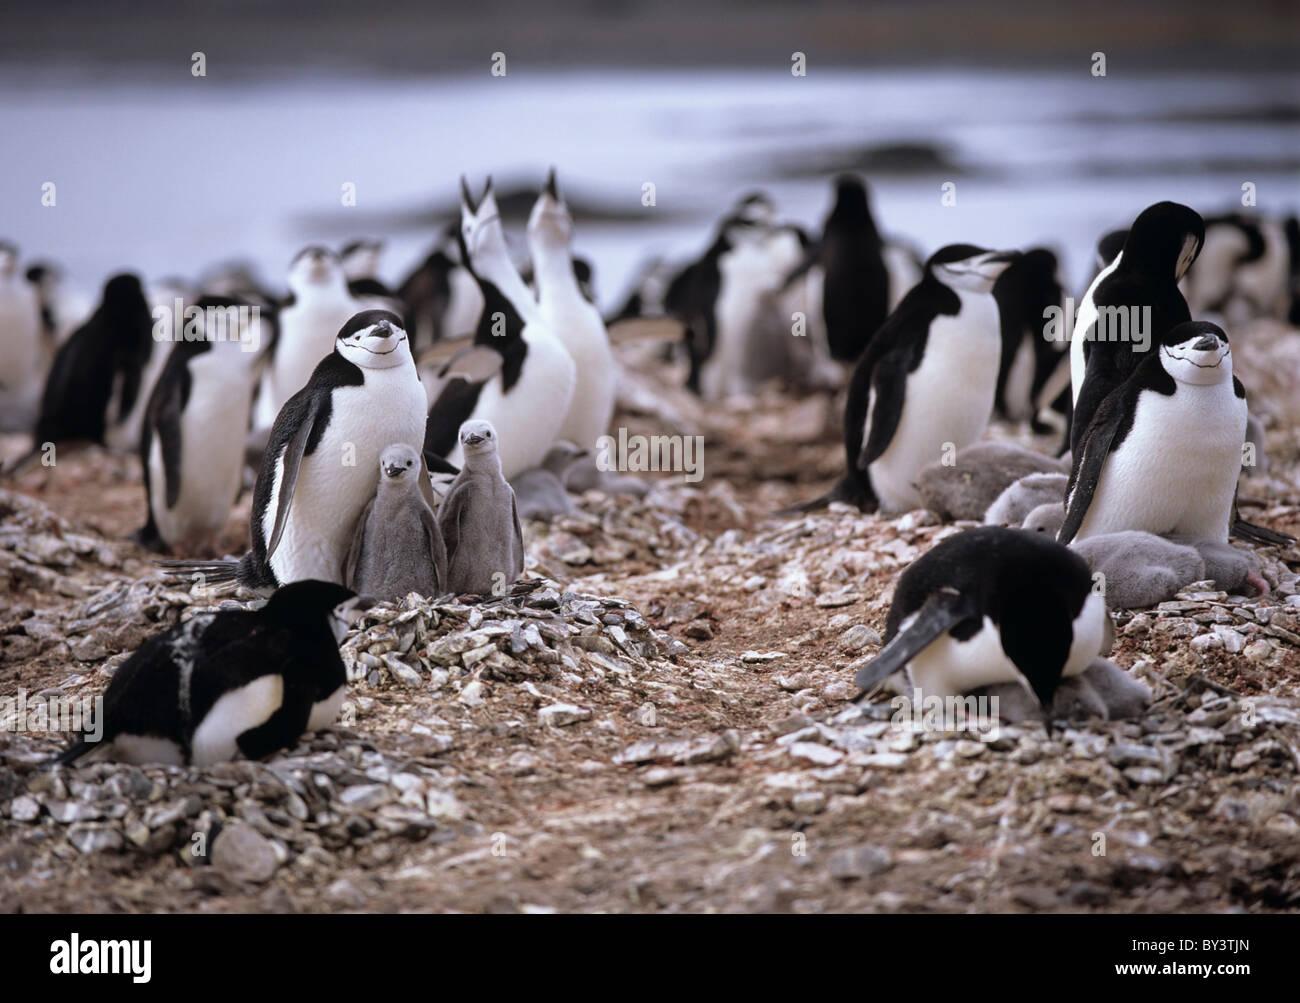 Colony of Chinstrap penguins Pygoscelis Antarctica, Antarctic Peninsula, Antarctica - Stock Image